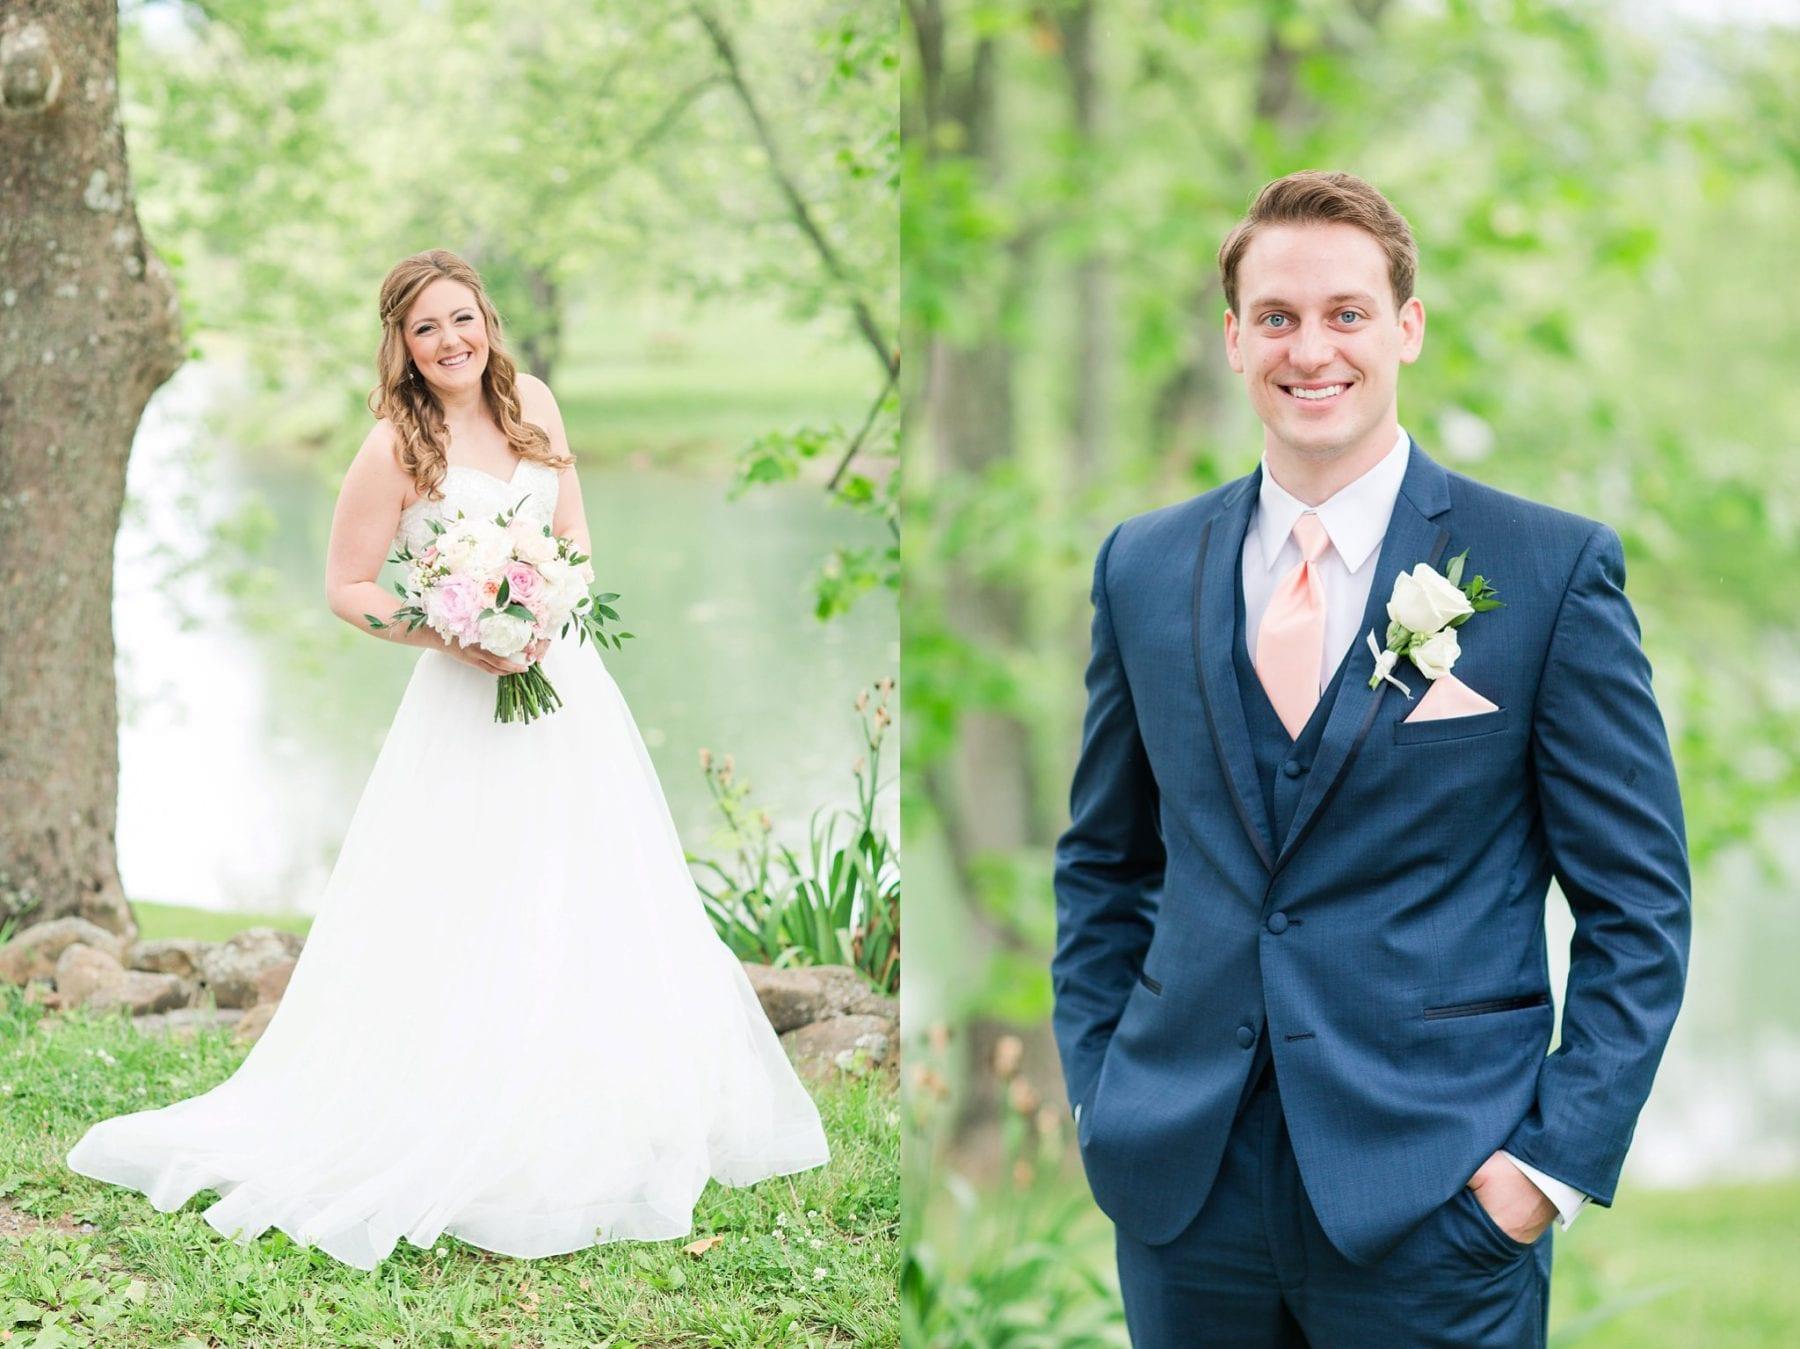 Justin & Megan Big Spring Farm Wedding Photos-110.jpg